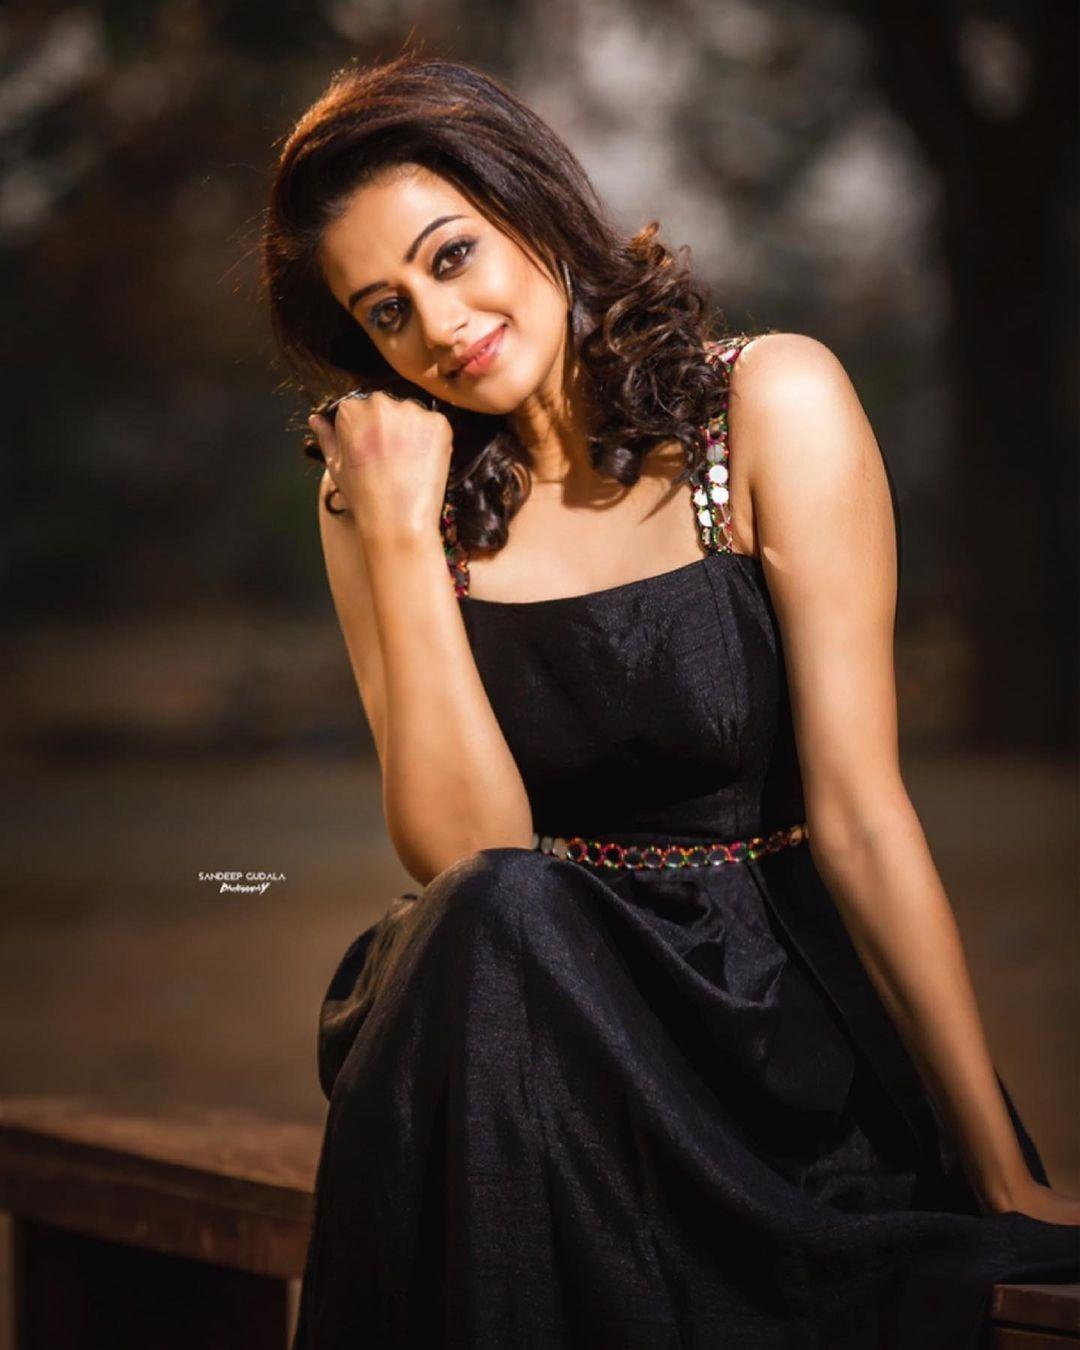 Priyamani raj in a custom made black dress my mehak shetty for dhee kings-2